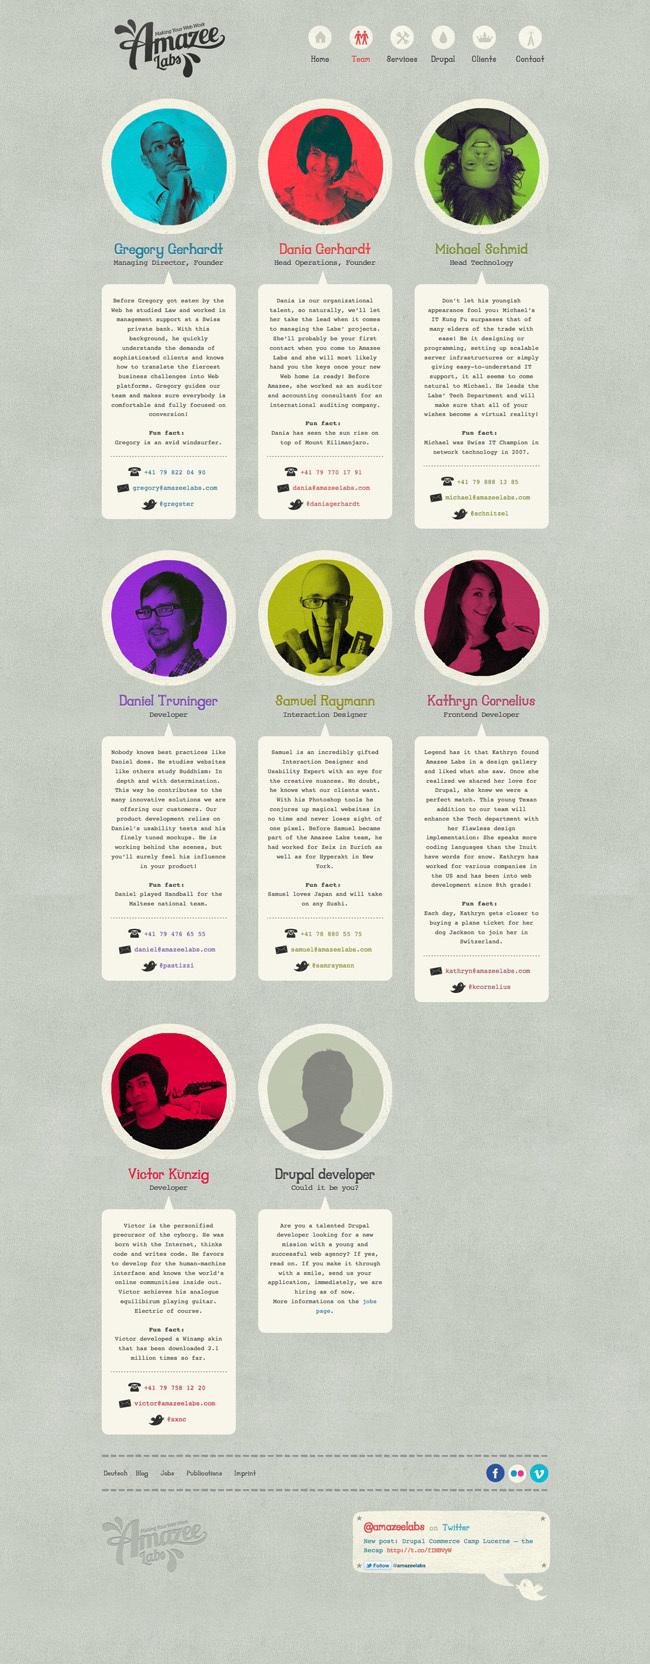 Amazee Labs<br /> http://www.amazeelabs.com/en/team